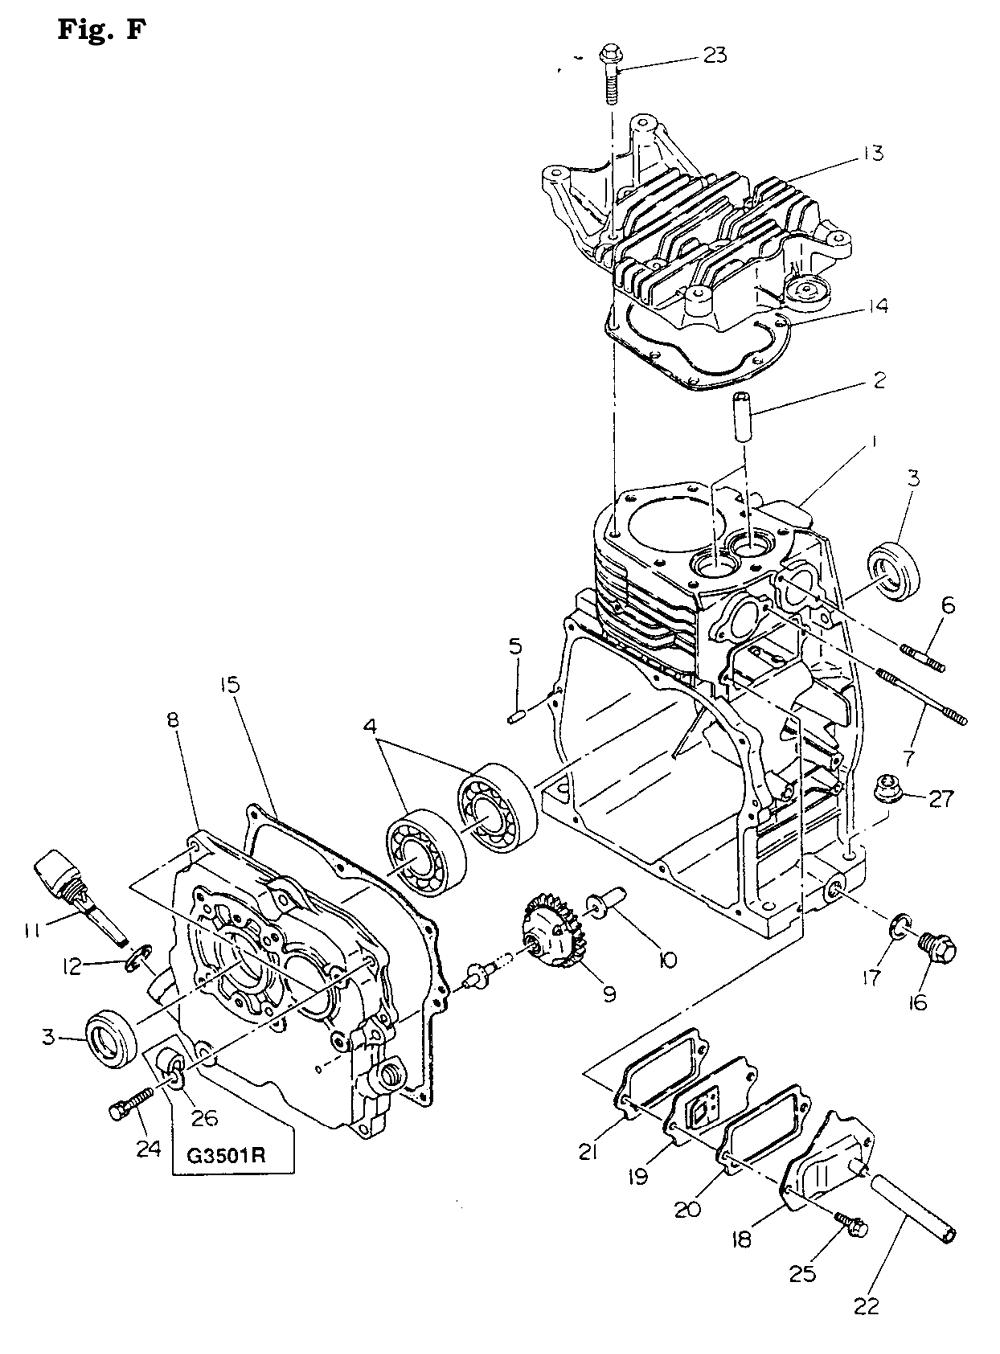 G3501R-makita-PB-5Break Down